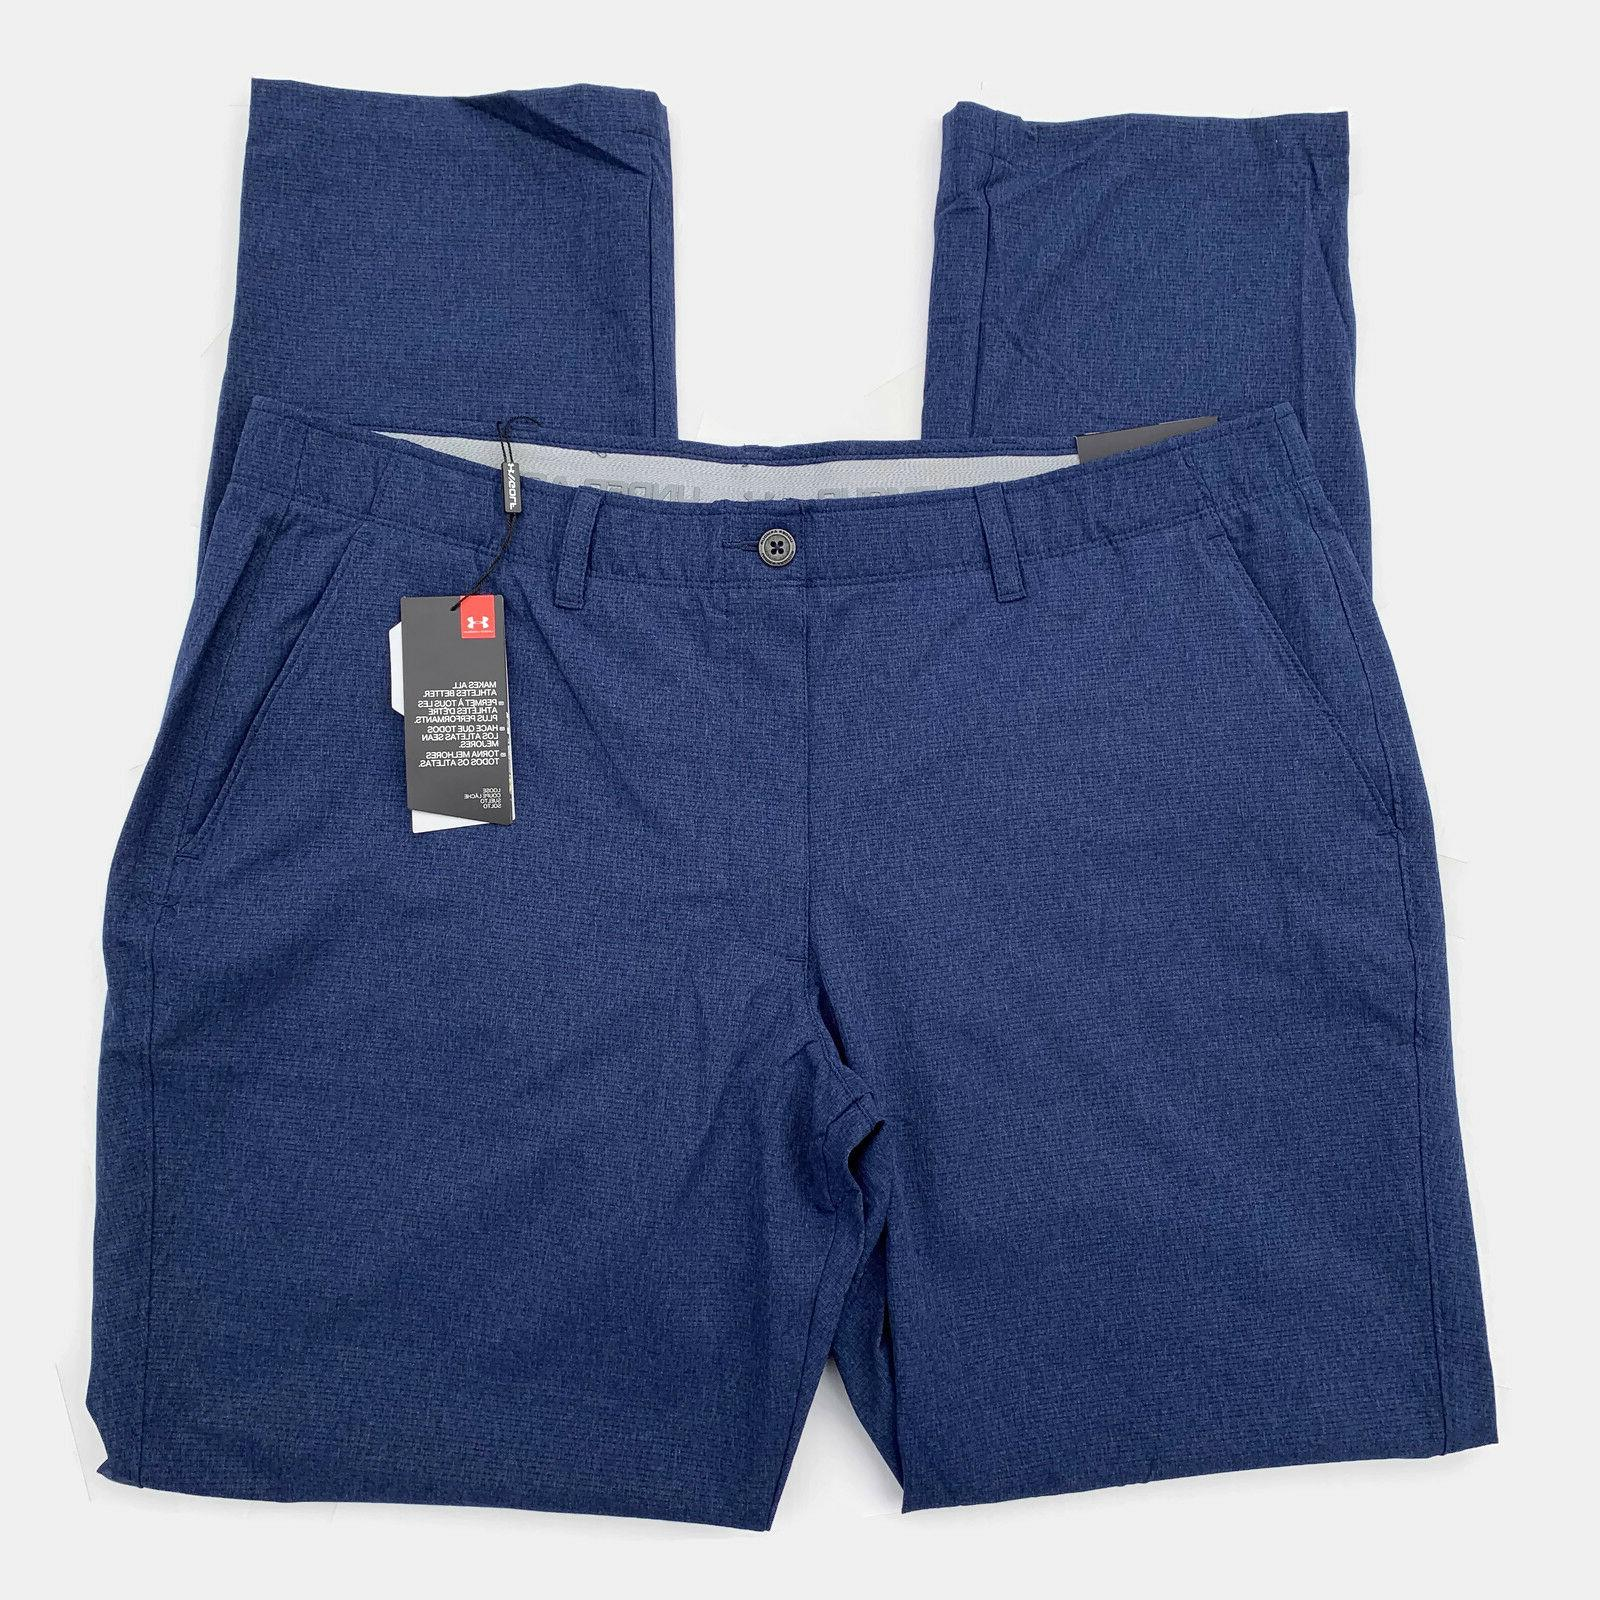 new men s size 42x36 loose fit